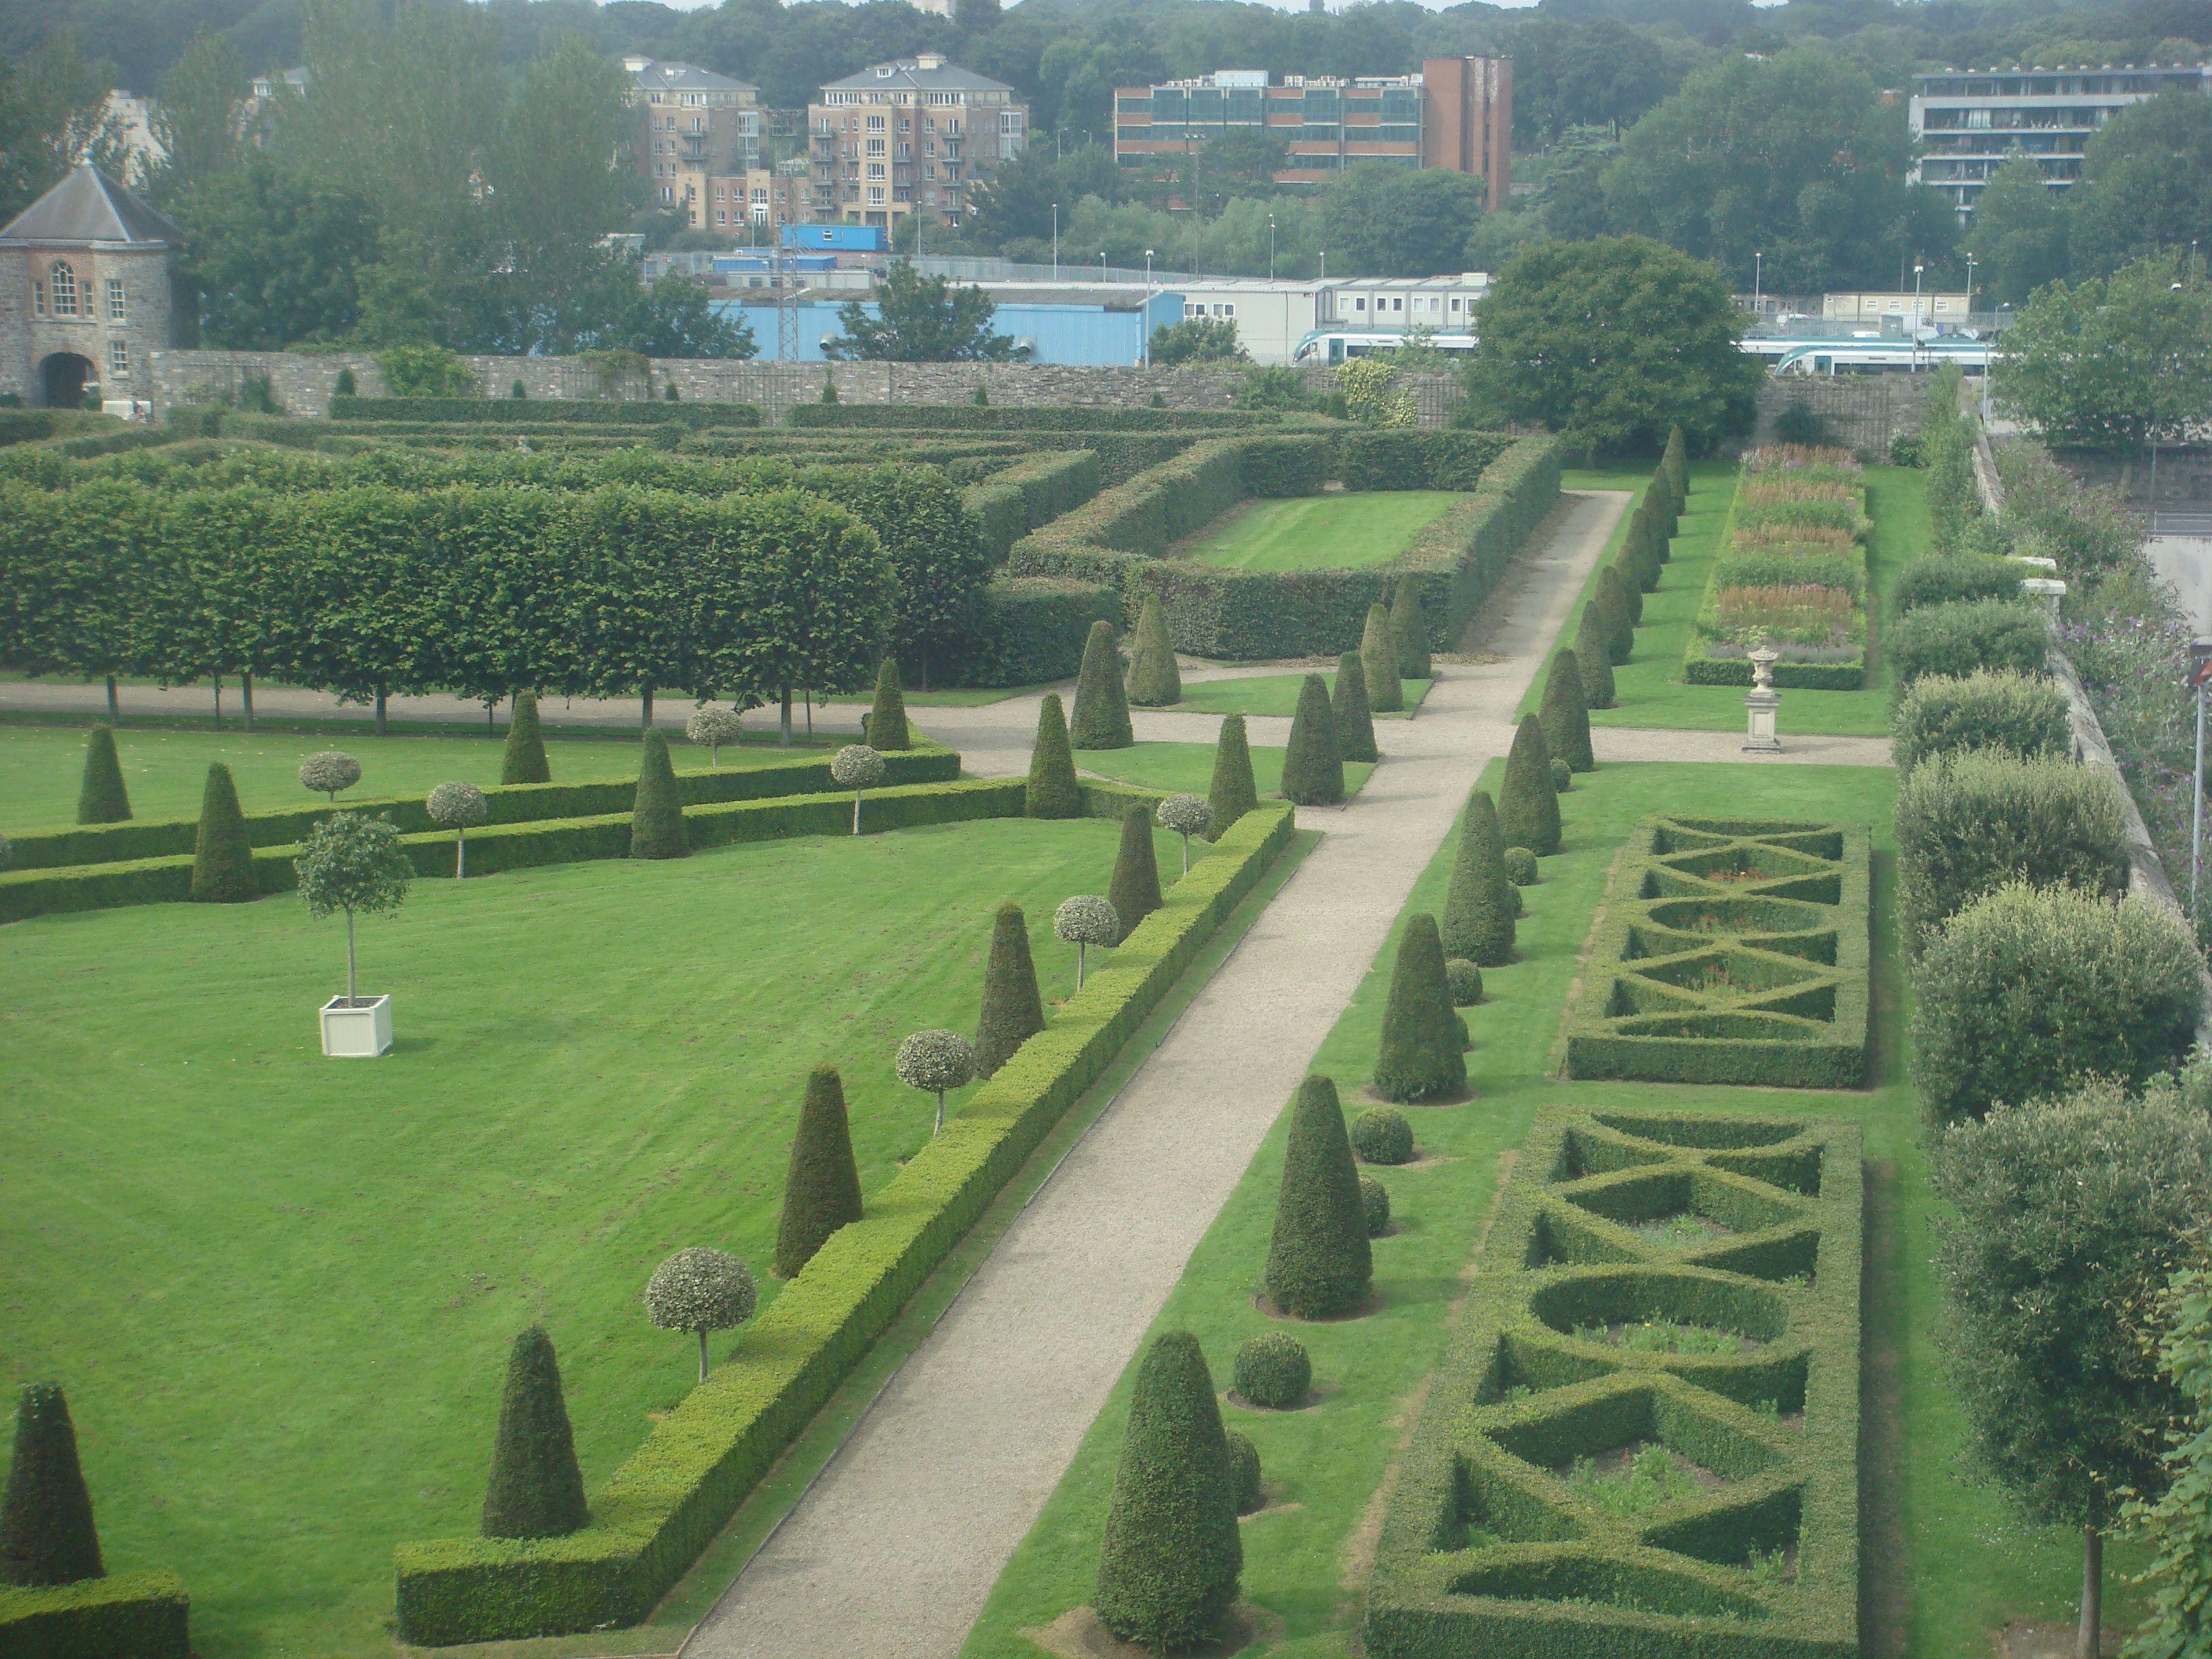 palace of versailles knot garden Google Search Garden design